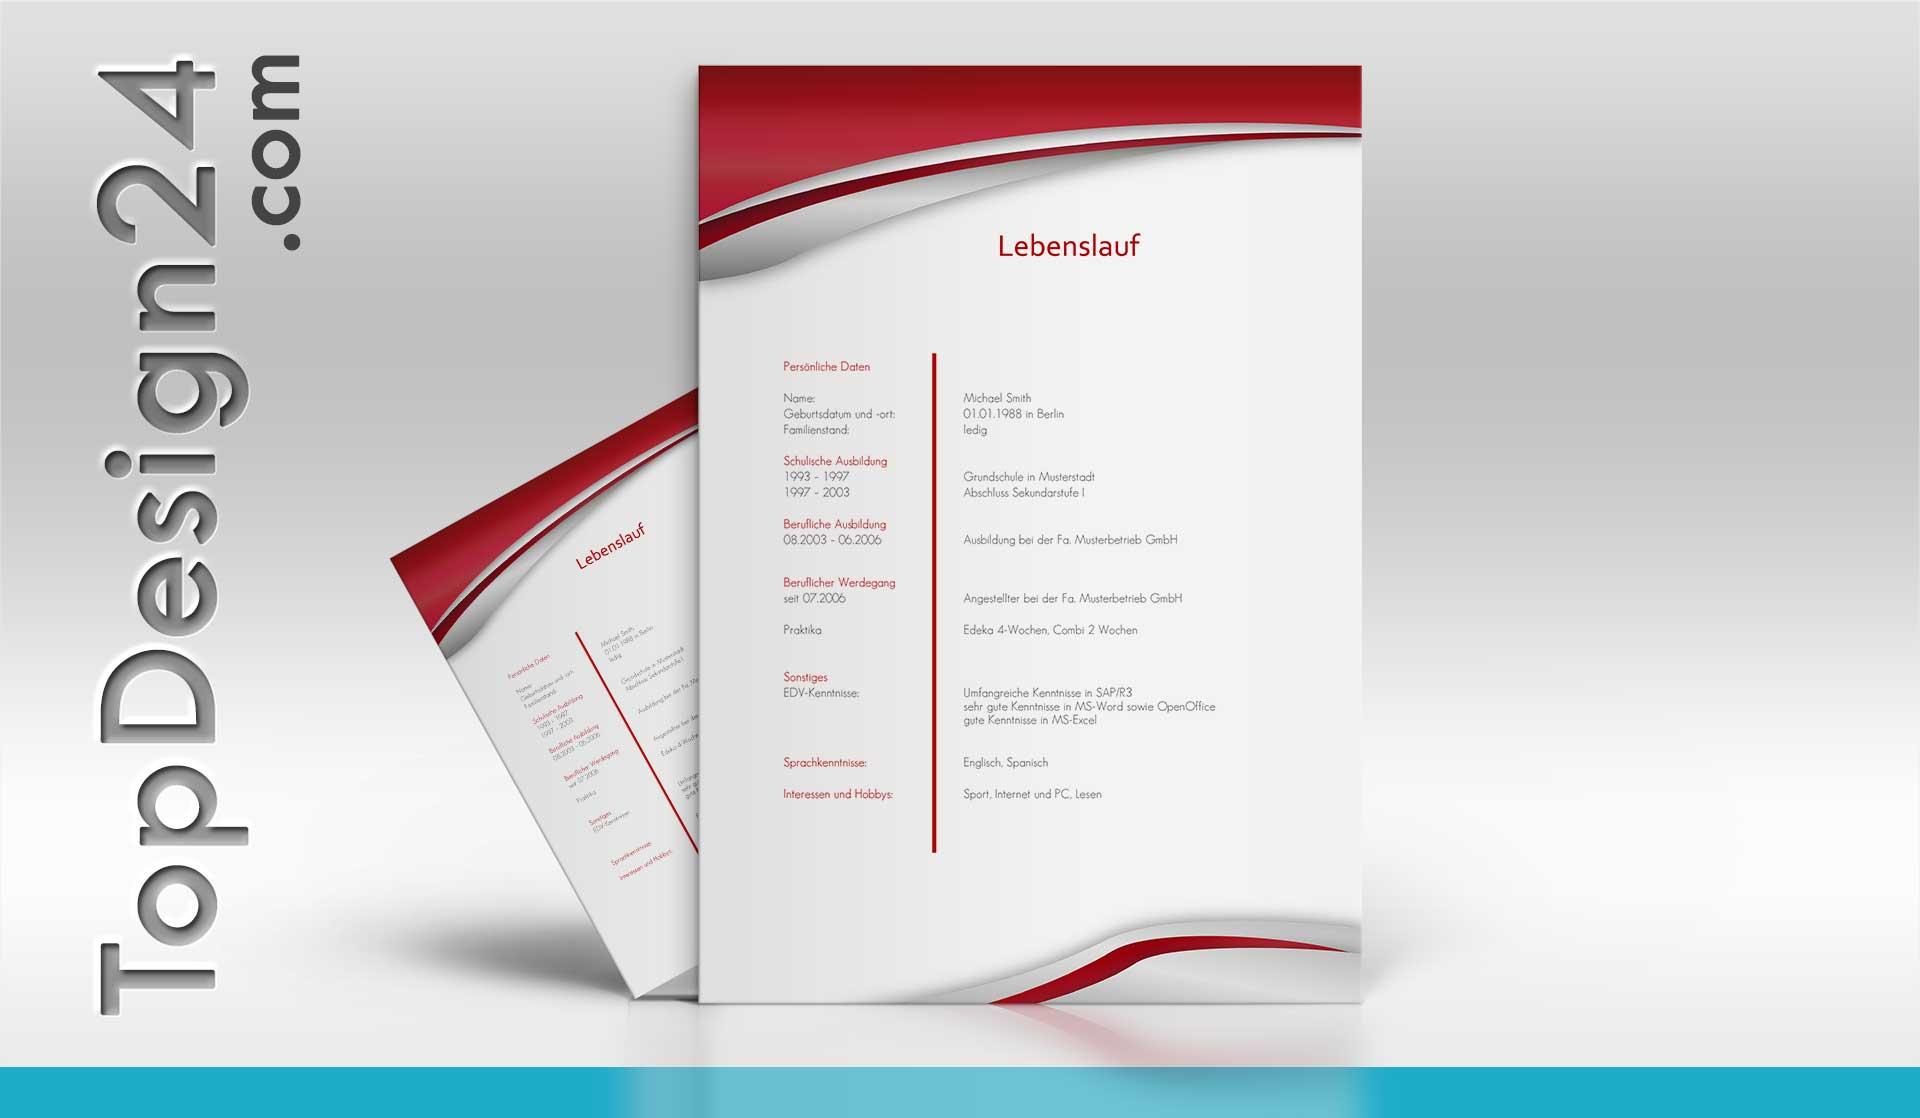 Lebenslauf-Muster-TopDesign24.com_.jpeg